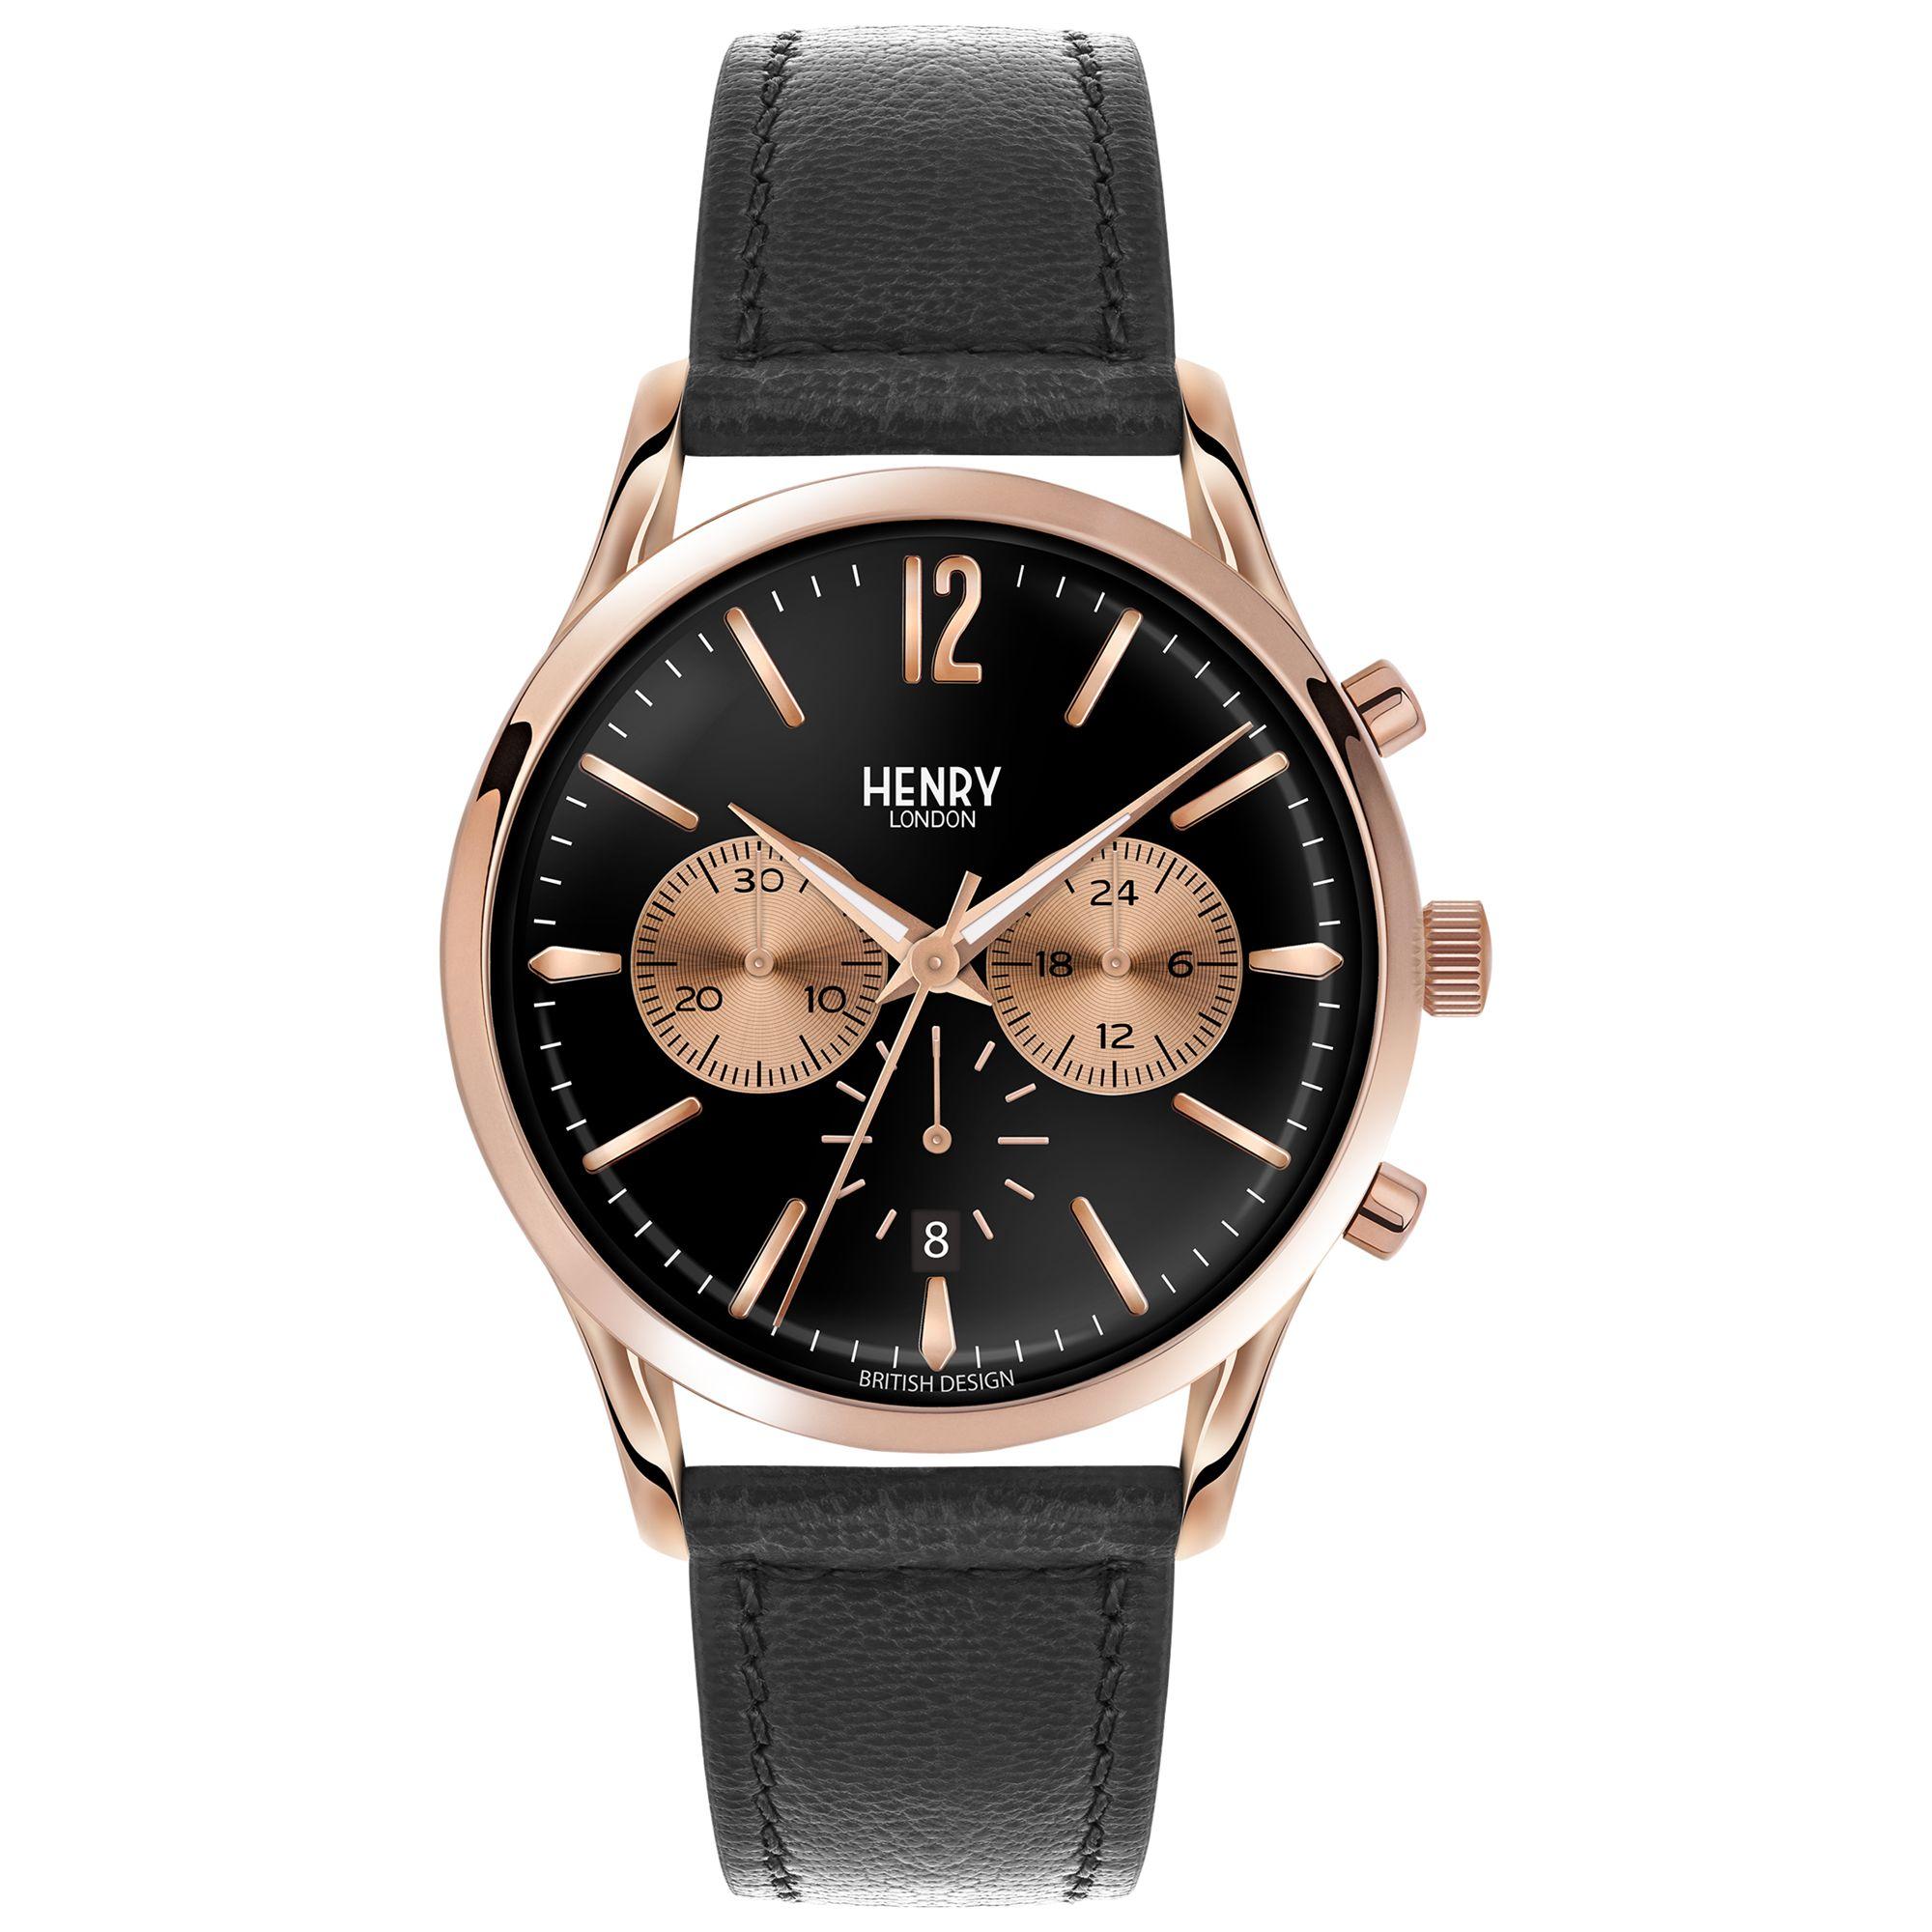 Henry London Henry London HL41-CS-0042 Men's Richmond Chronograph Date Leather Strap Watch, Black